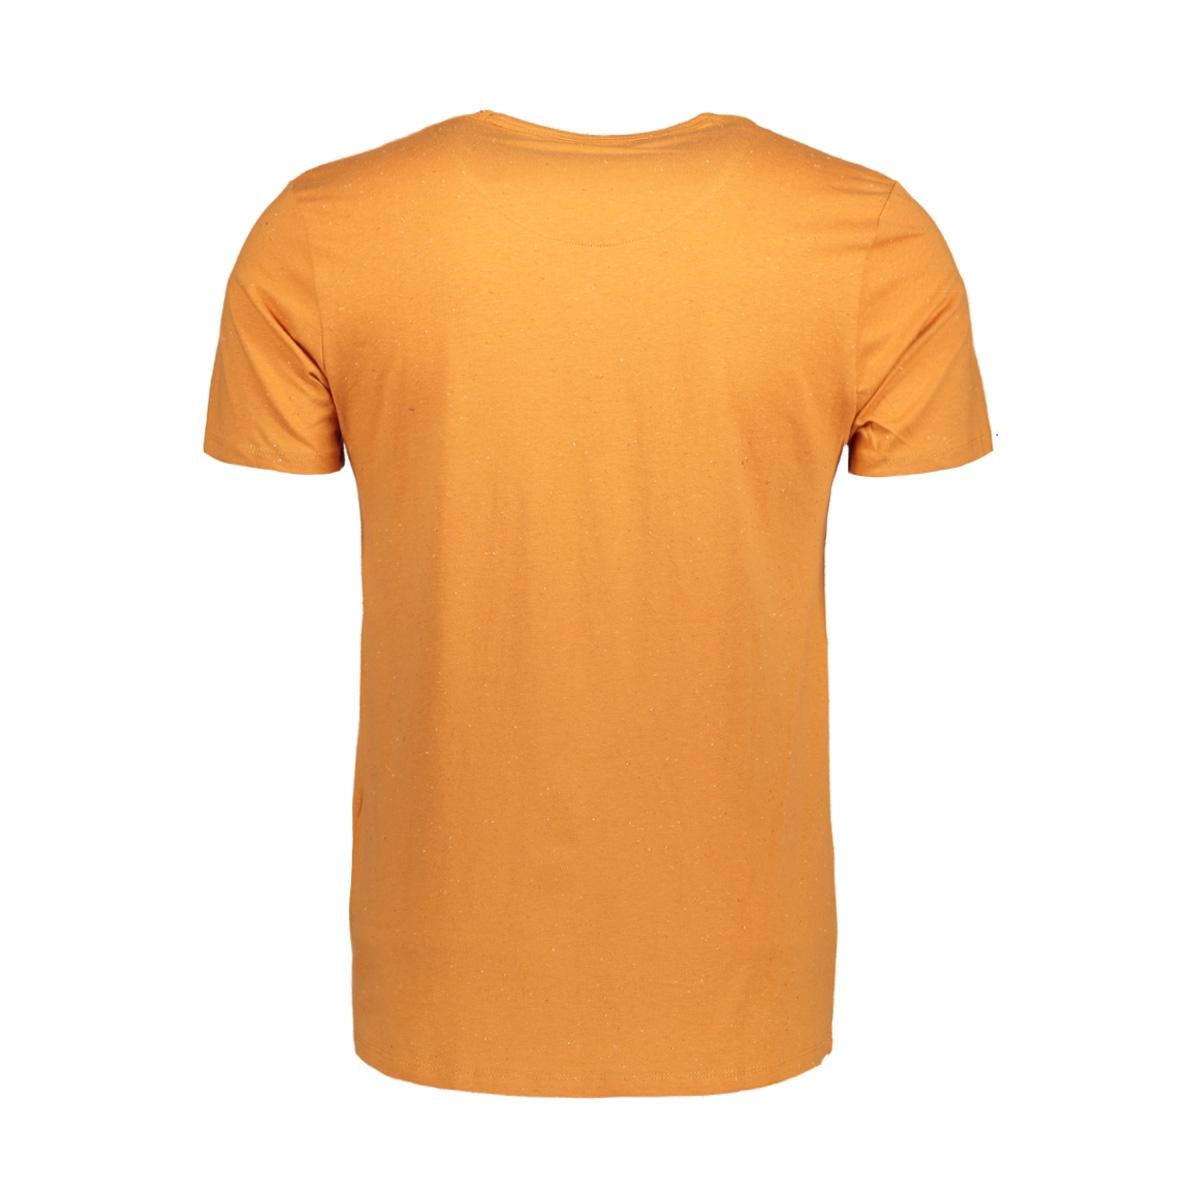 1055136.62.12 tom tailor t-shirt 3568